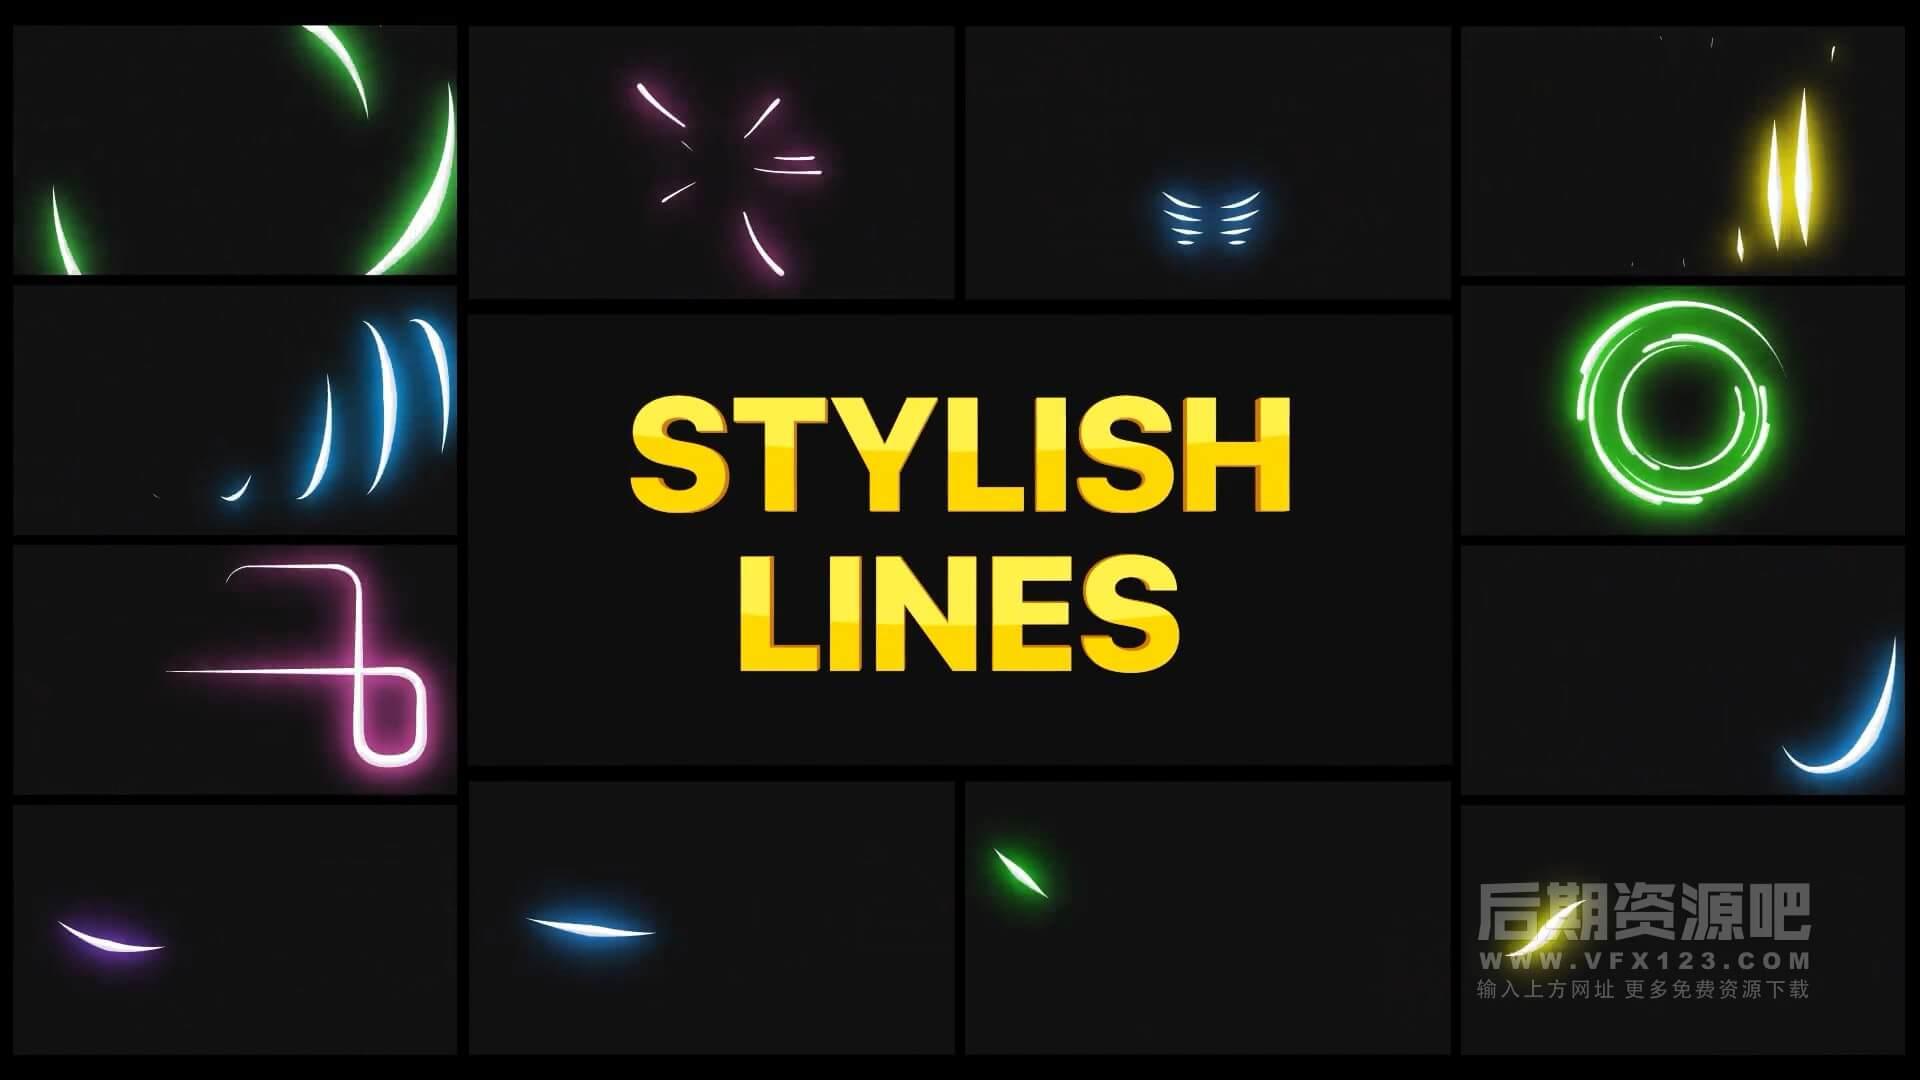 fcpx插件 卡通多彩装饰发光形状线条动画 Stylish Lines